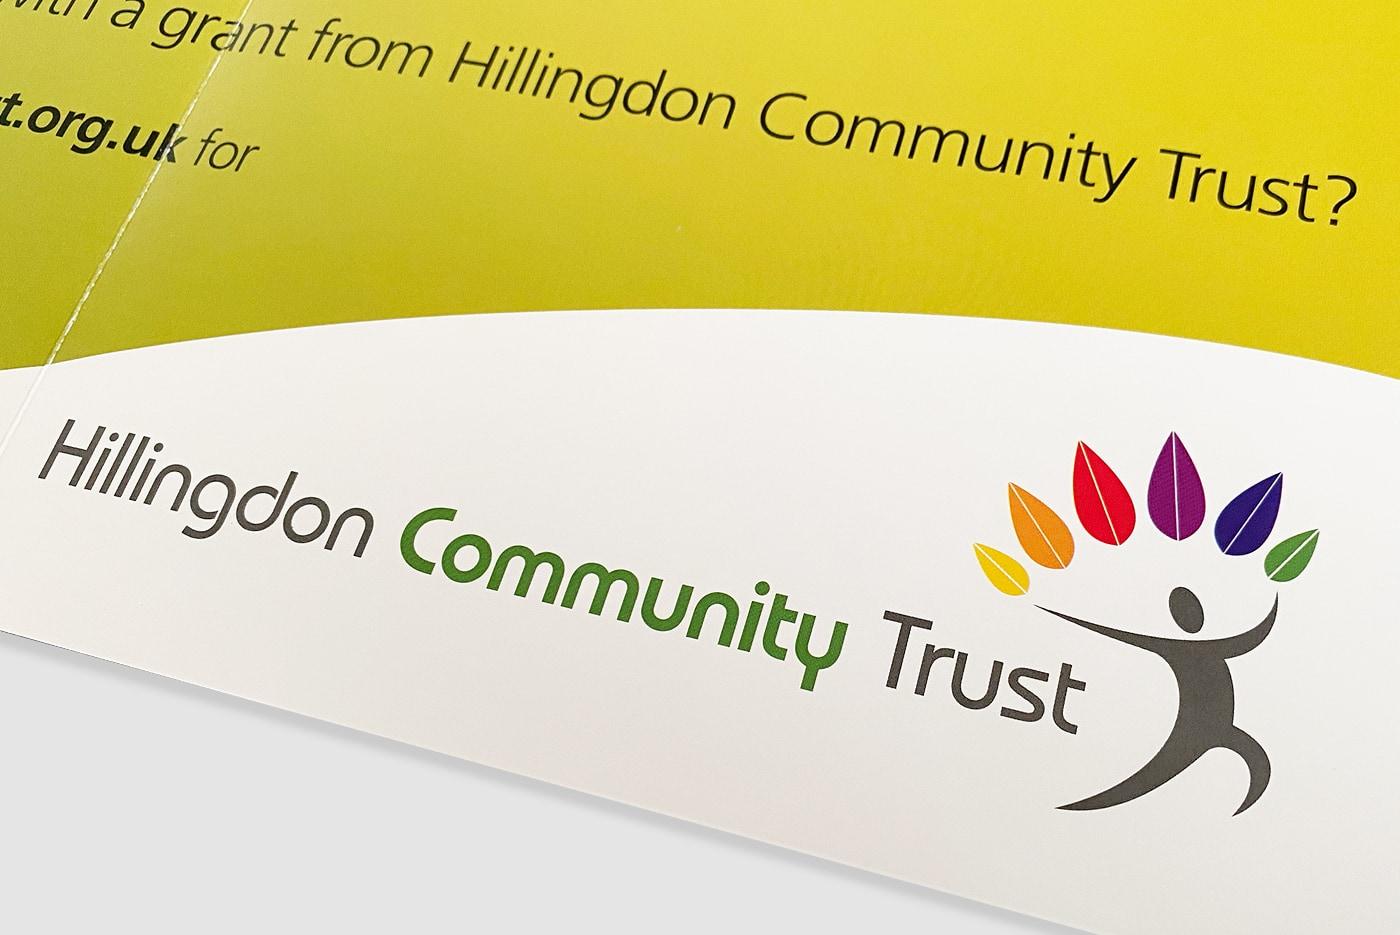 Hillingdon Community Trust